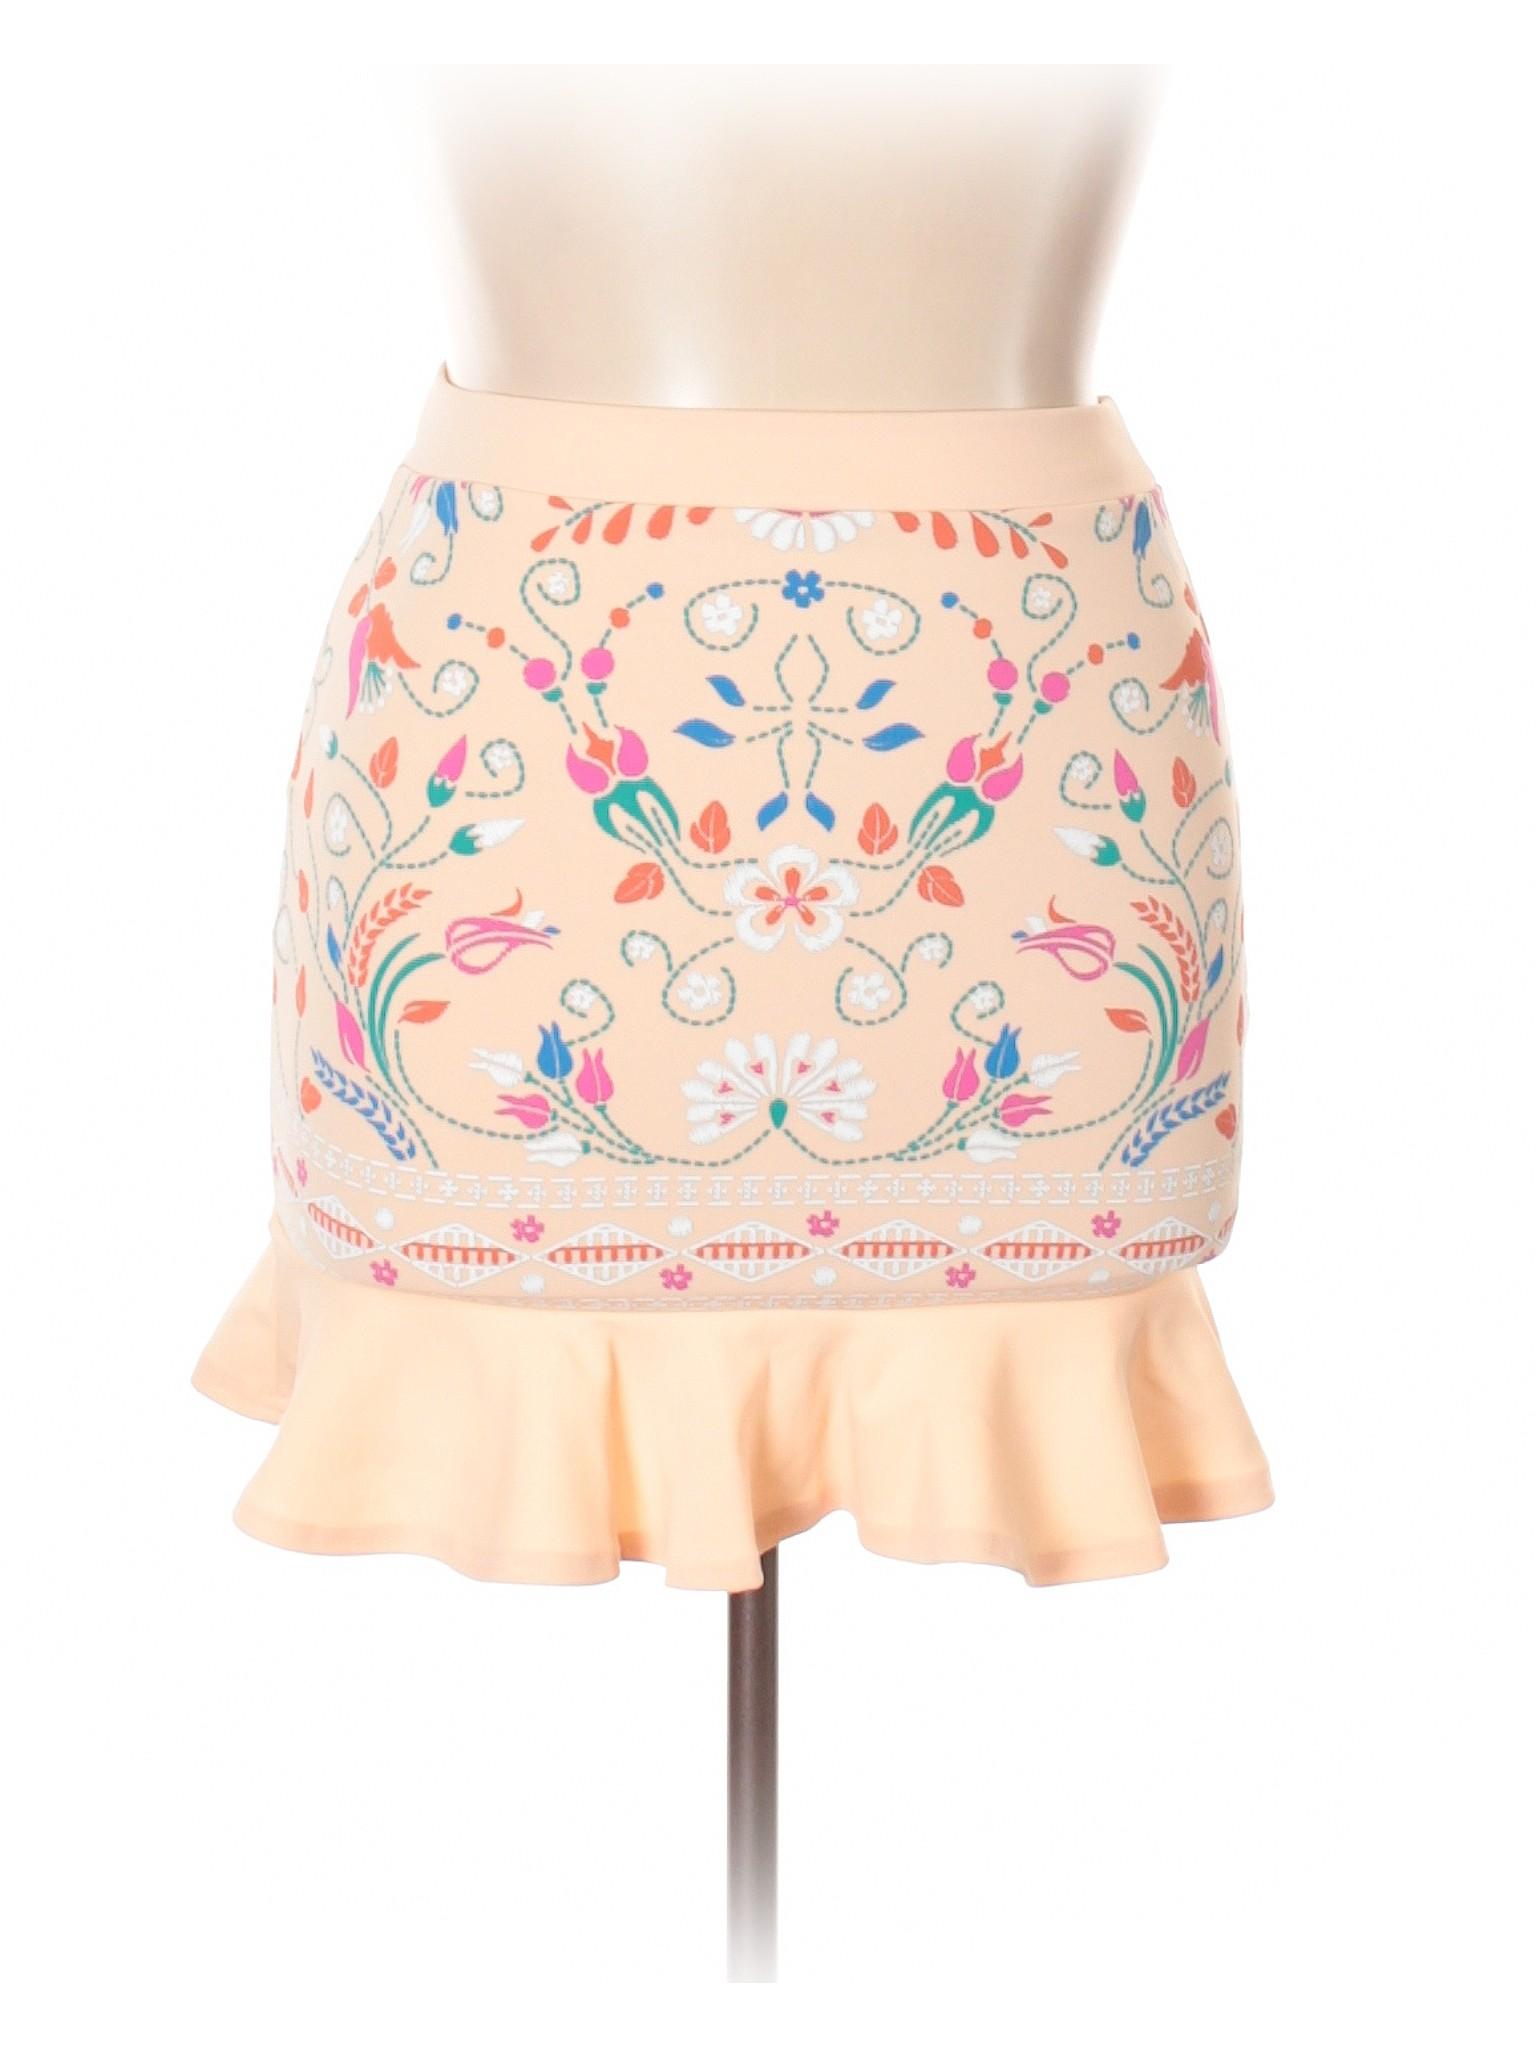 Boutique Boutique Skirt Skirt Casual Casual Casual Skirt Casual Boutique Boutique Casual Casual Boutique Skirt Boutique Skirt OnAxwPq